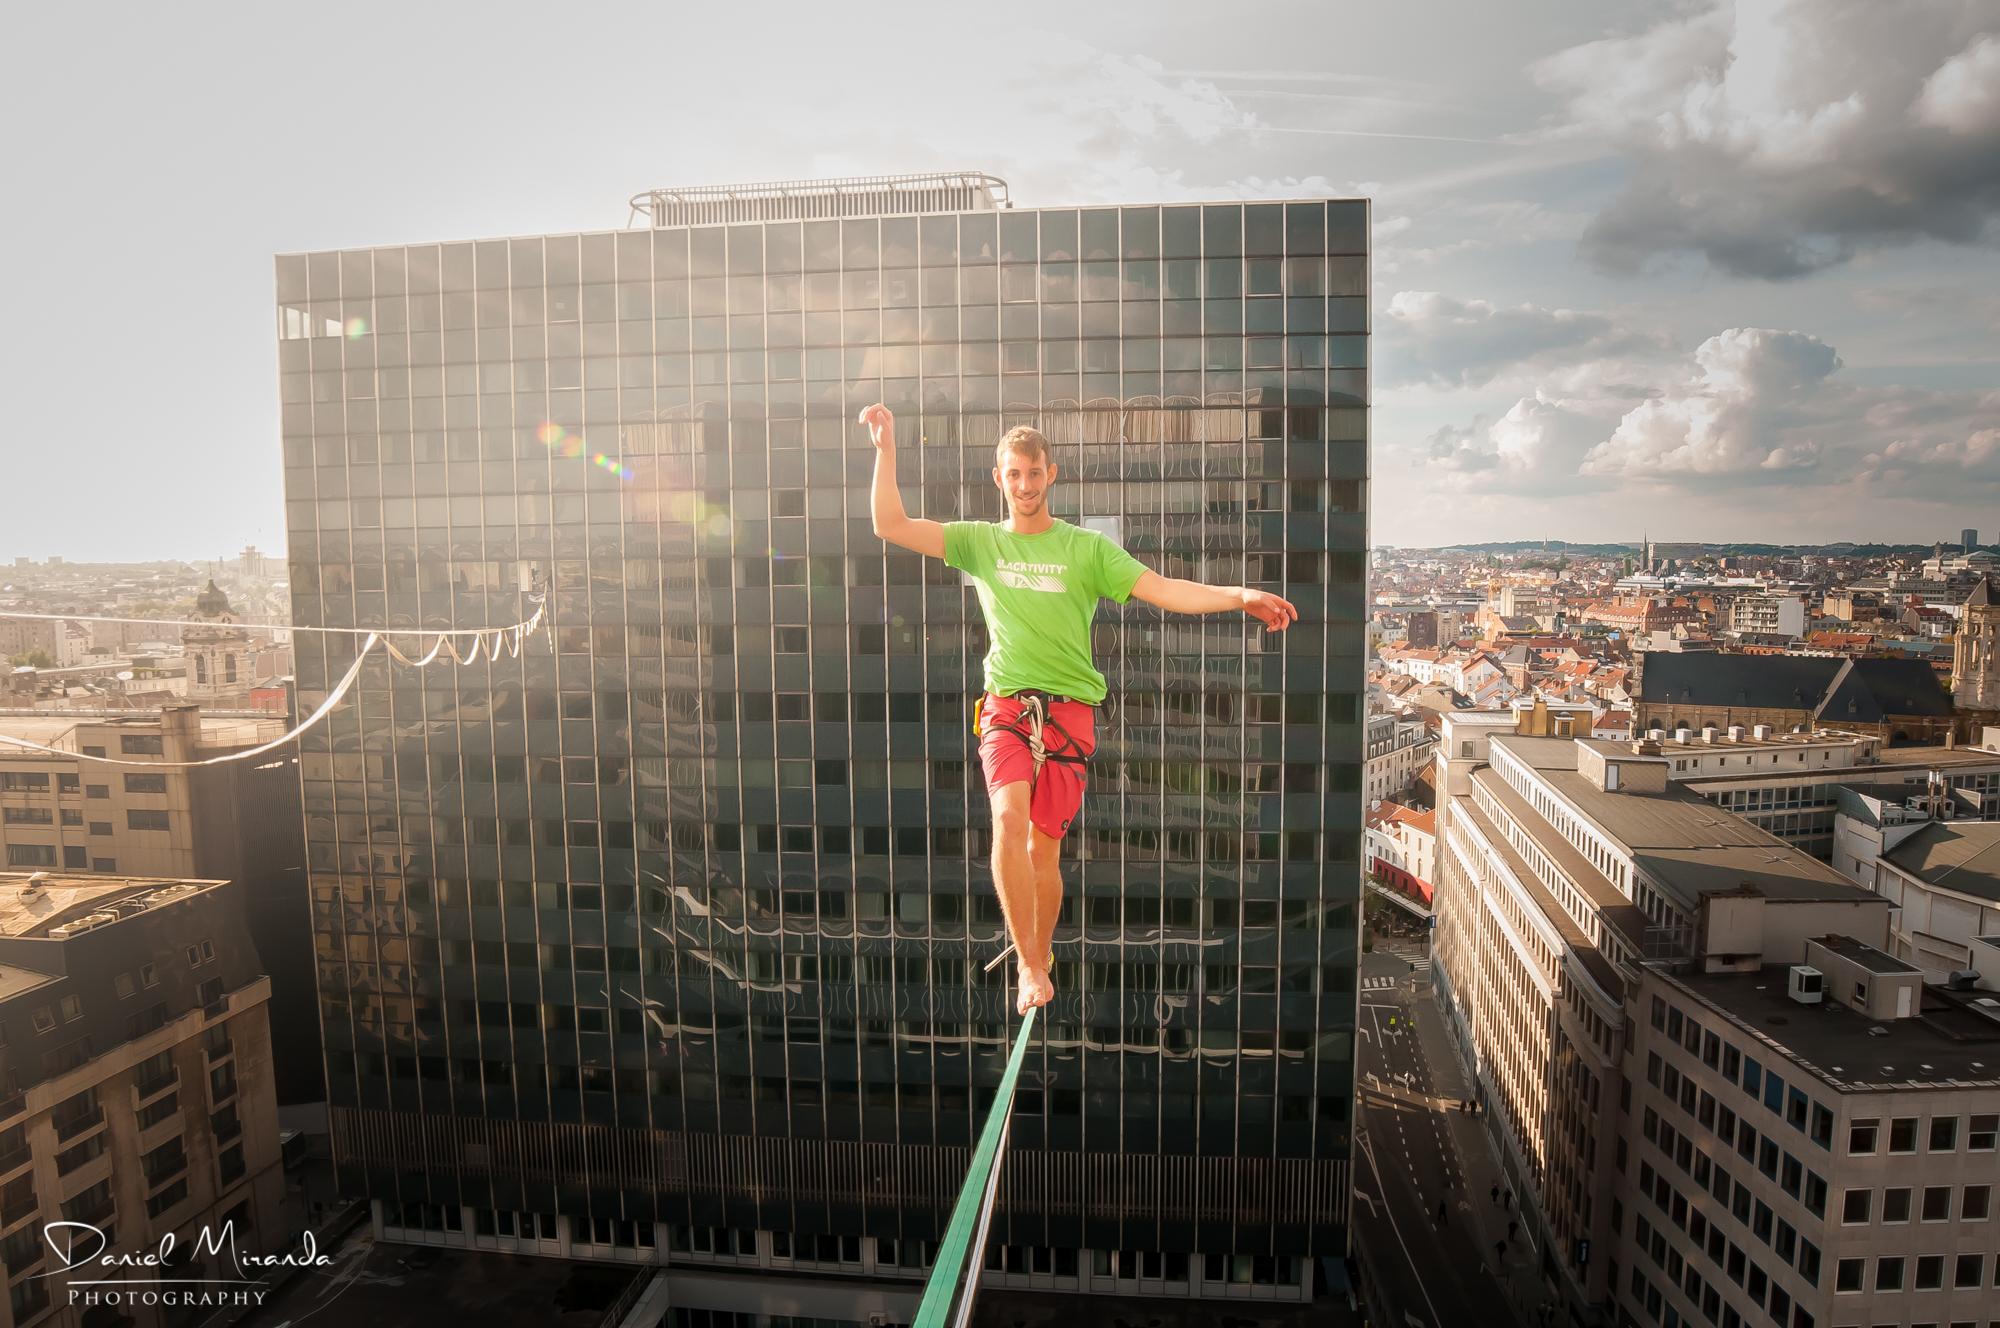 bruxelles brussels zot day belgium skyscraper  Slackline Lyell Grunberg show performance spectacle Highline trickline.jpg